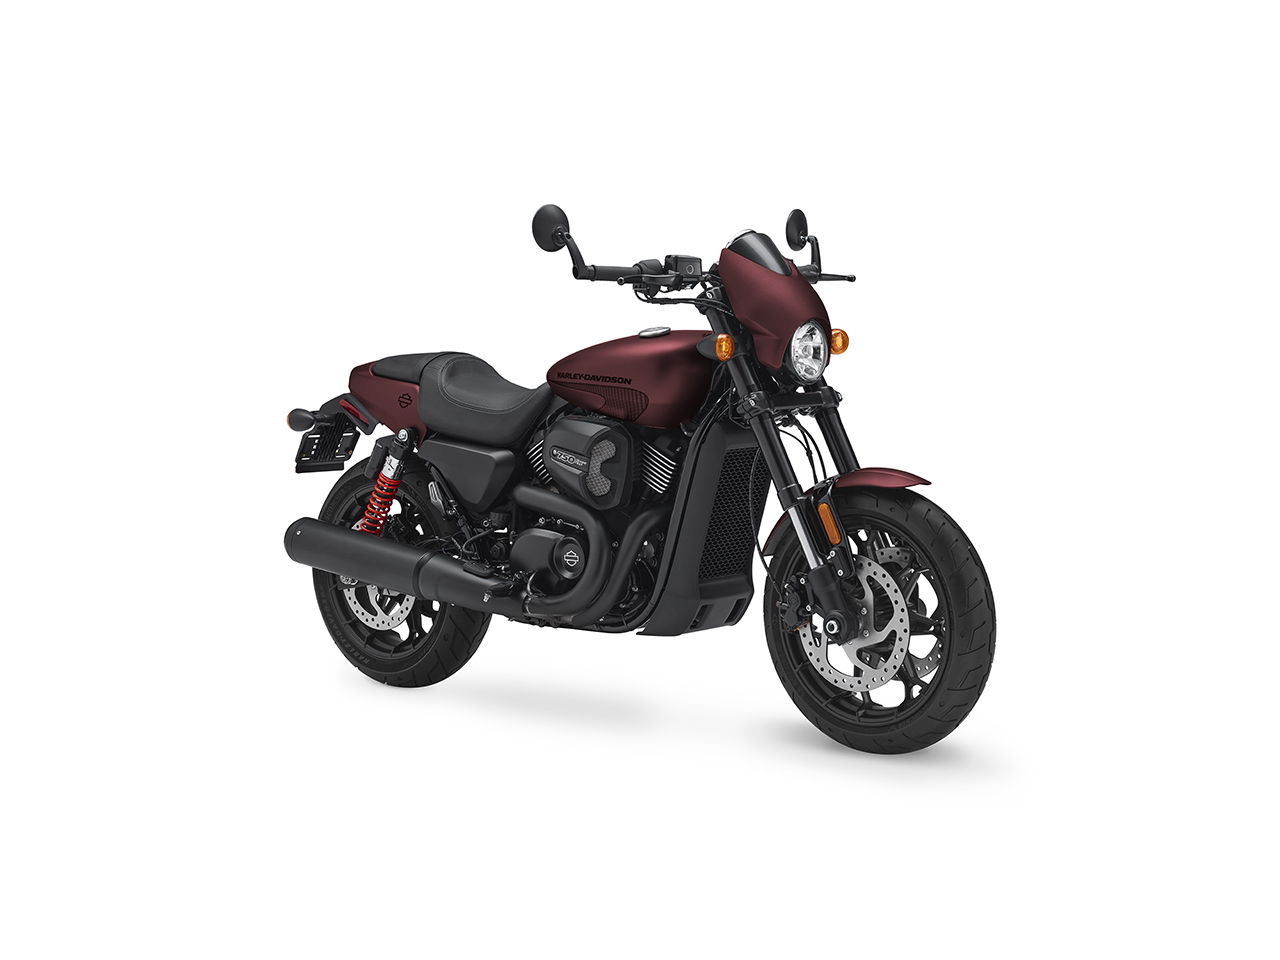 2018 Harley-Davidson Street Rod 750 Image